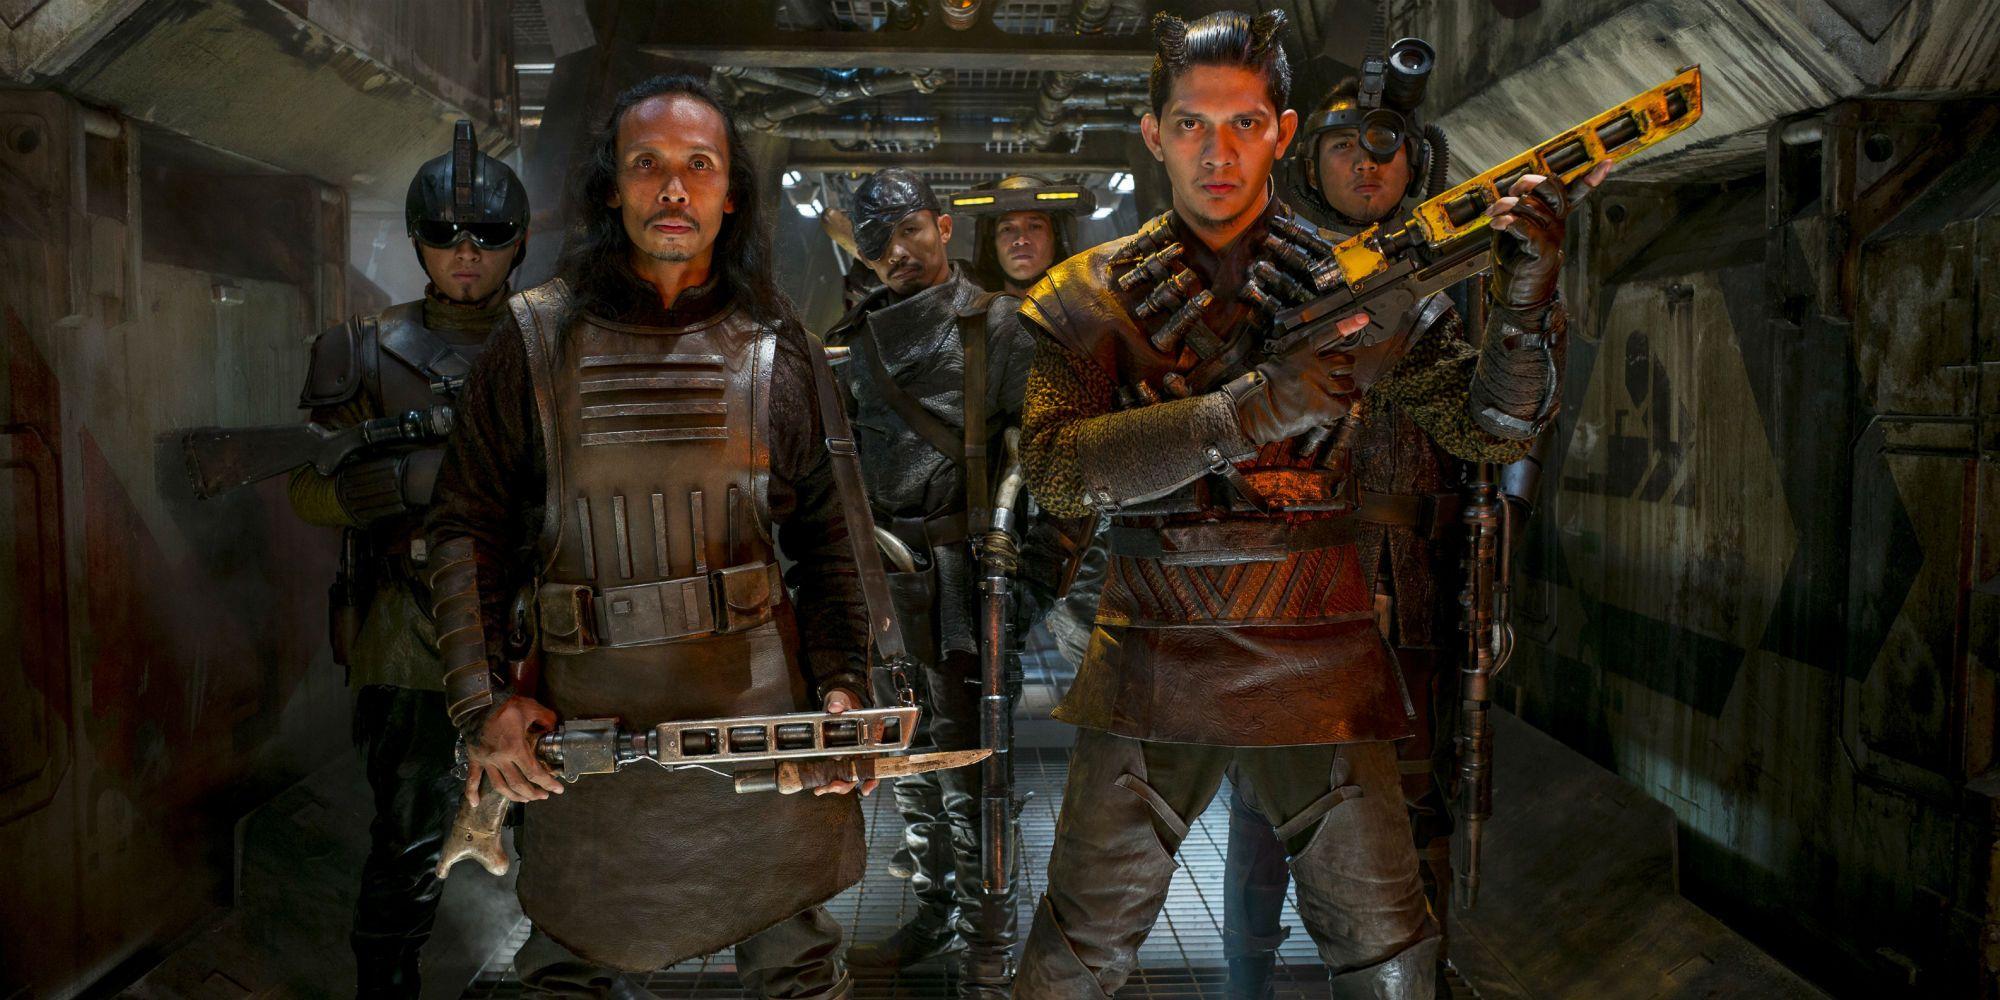 Star Wars The Force Awakens Wasted Iko Uwais Razoo Quin Fee